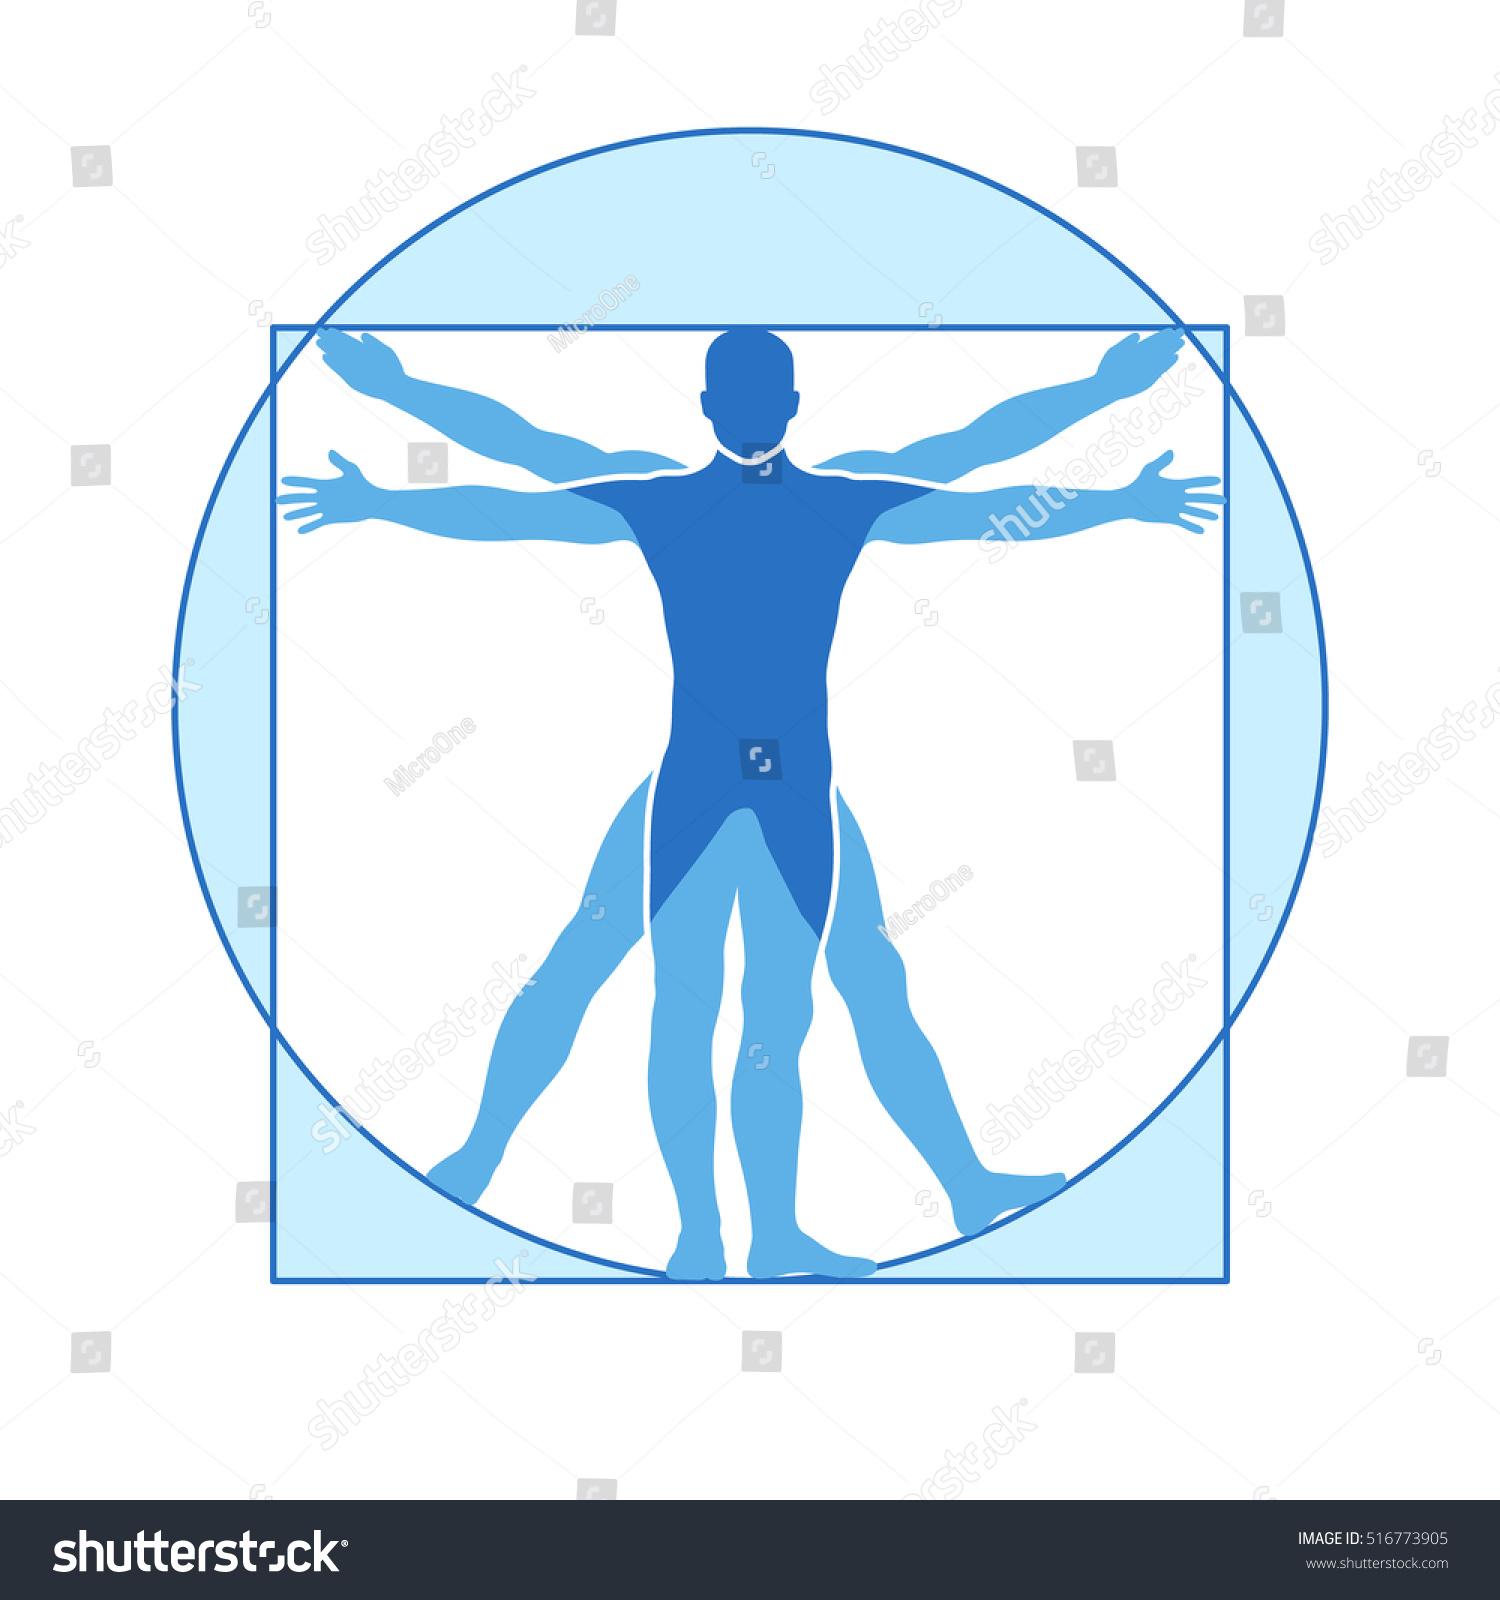 human body vector icon similar vitruvian stock vector royalty free 516773905 https www shutterstock com image vector human body vector icon similar vitruvian 516773905